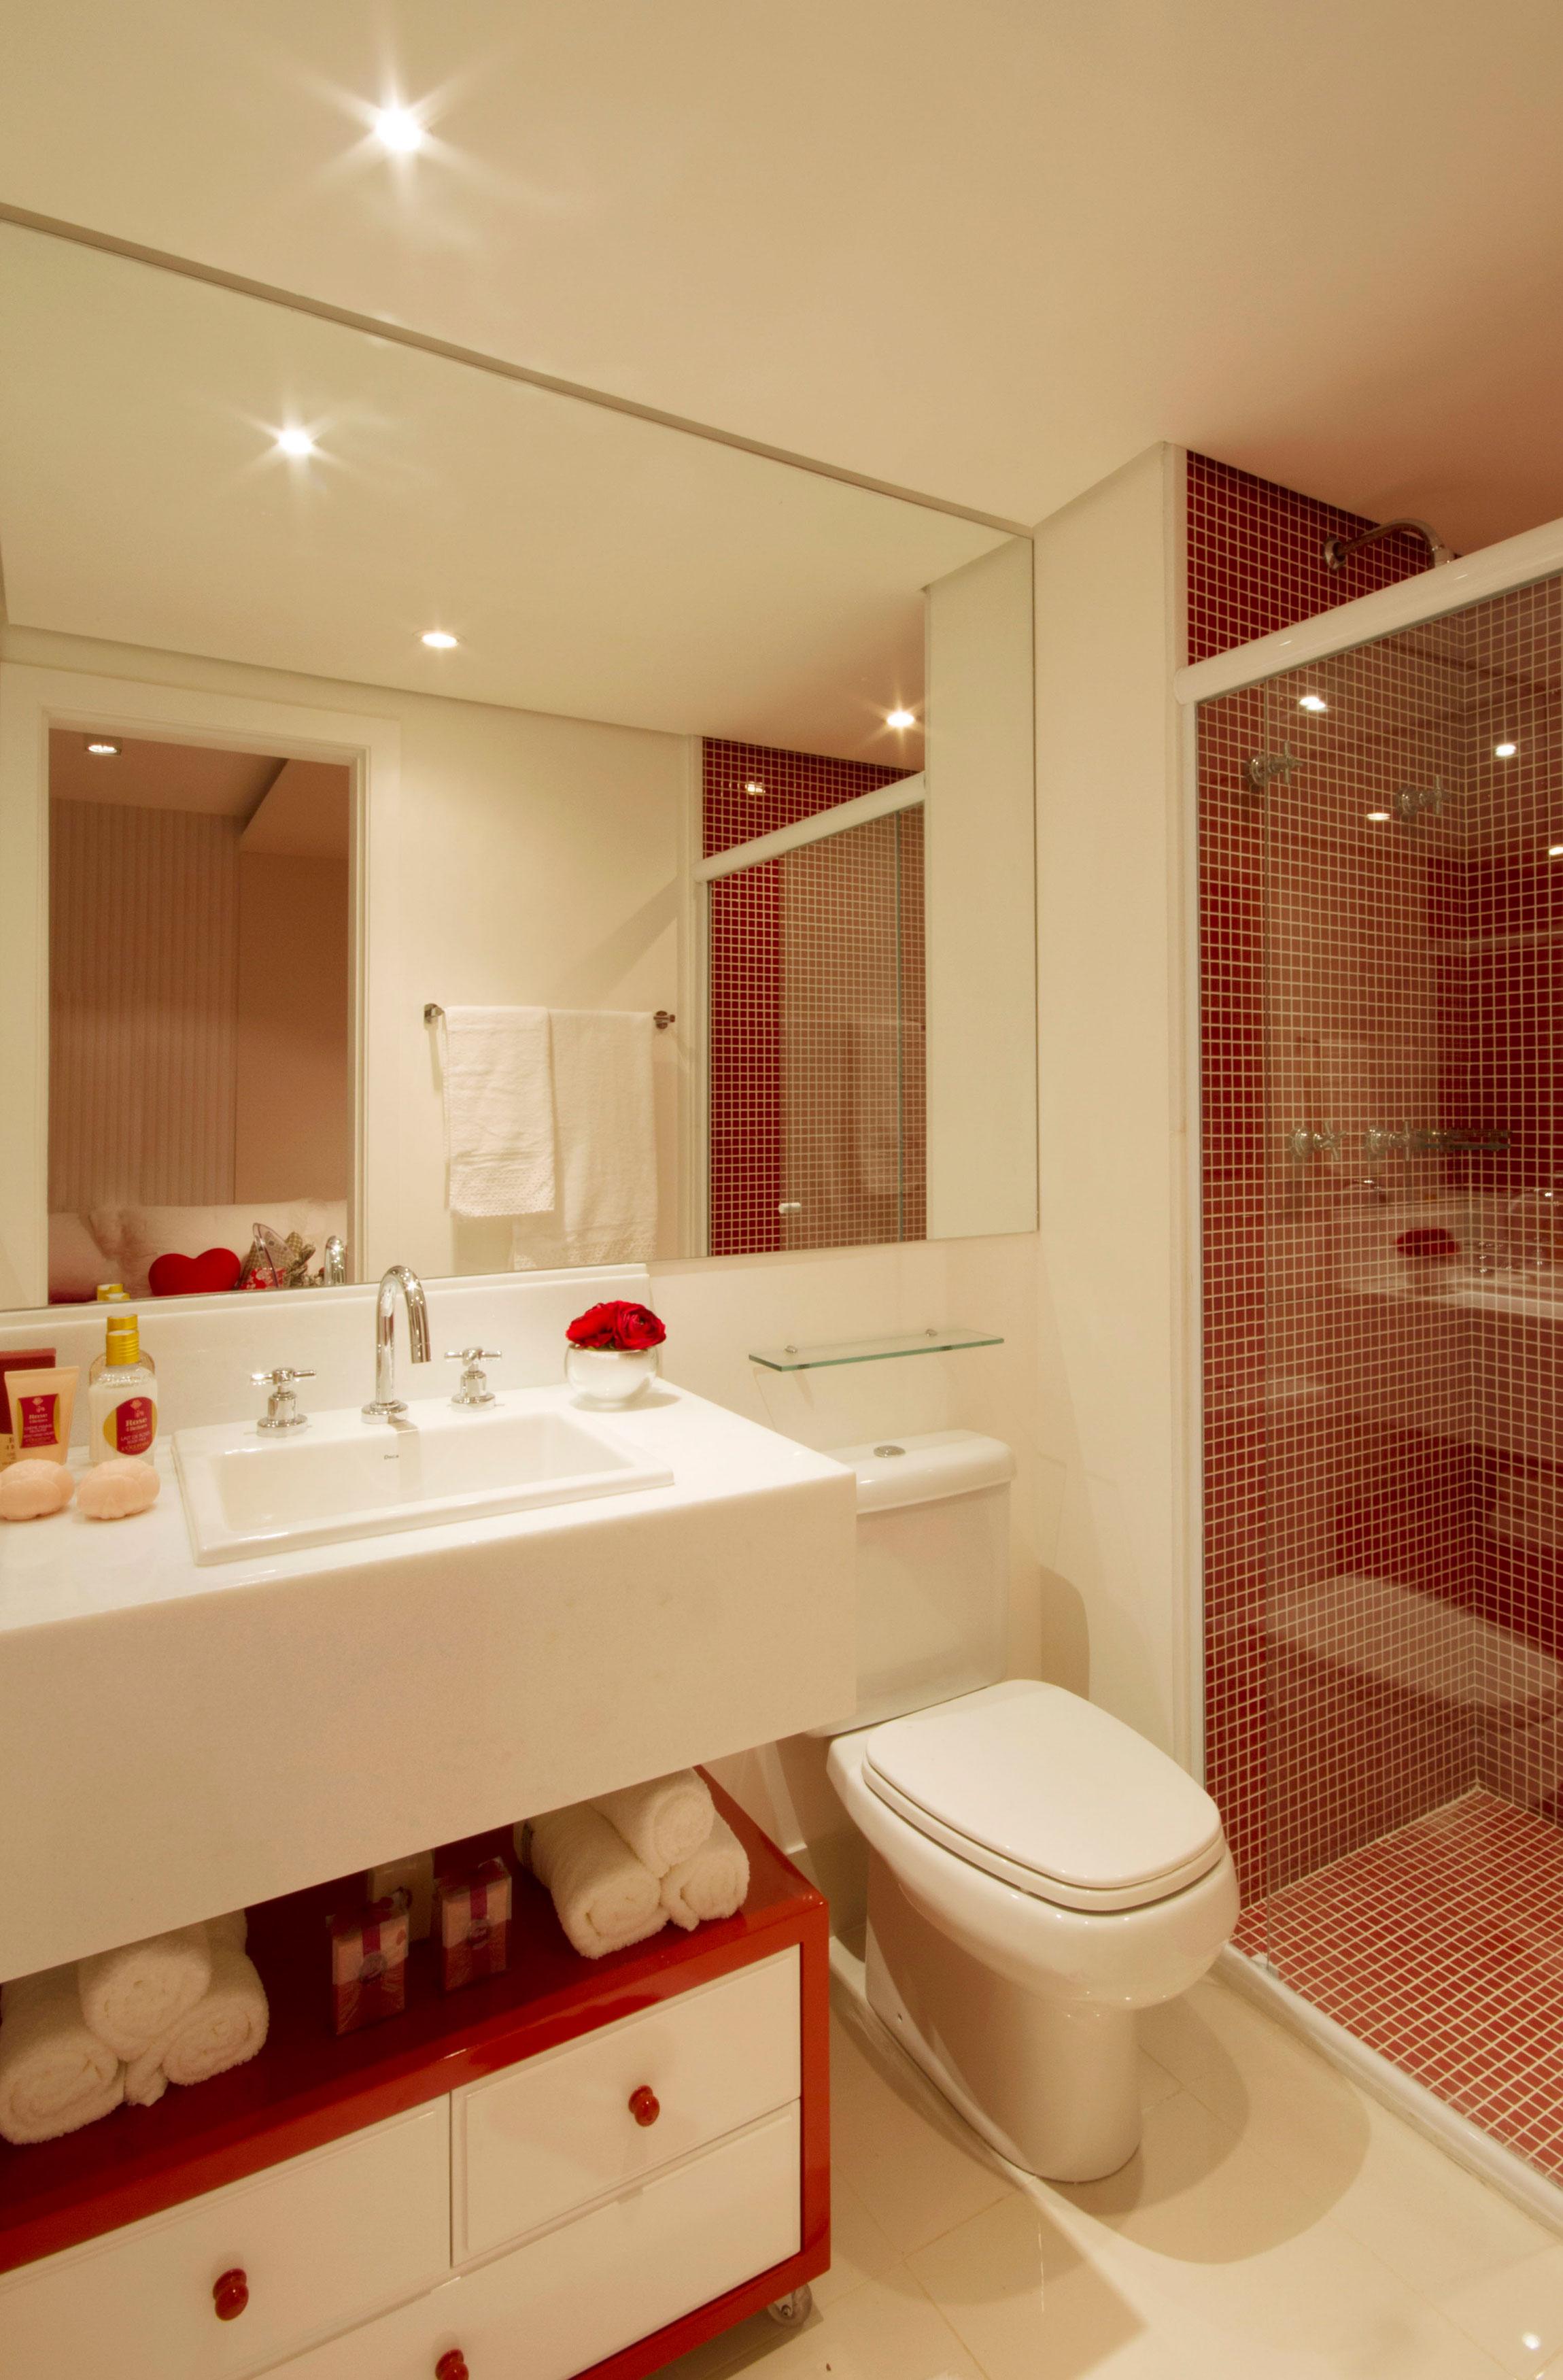 108 m² - Banheiro da menina